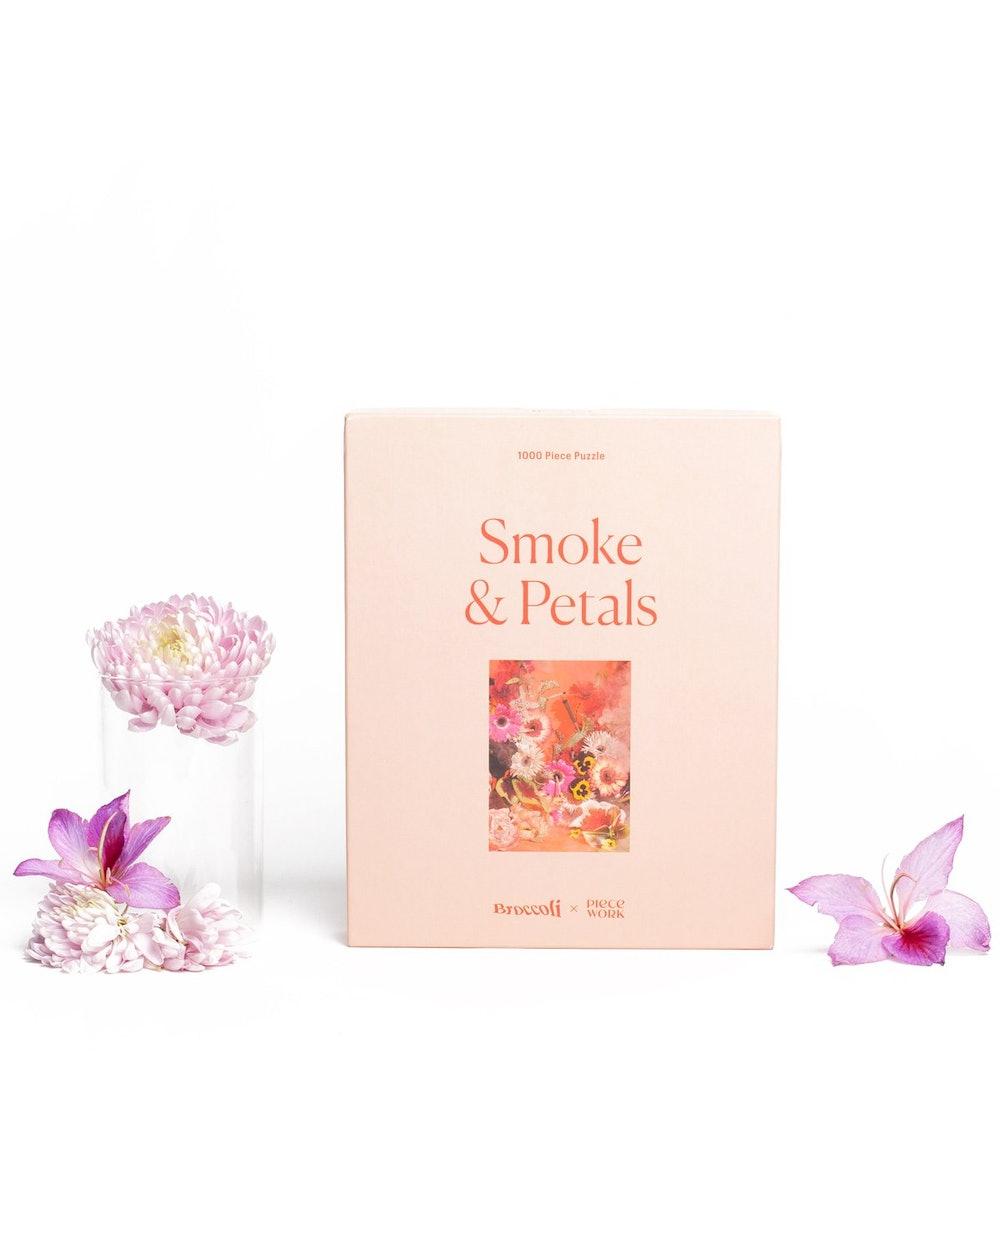 Smoke & Petals